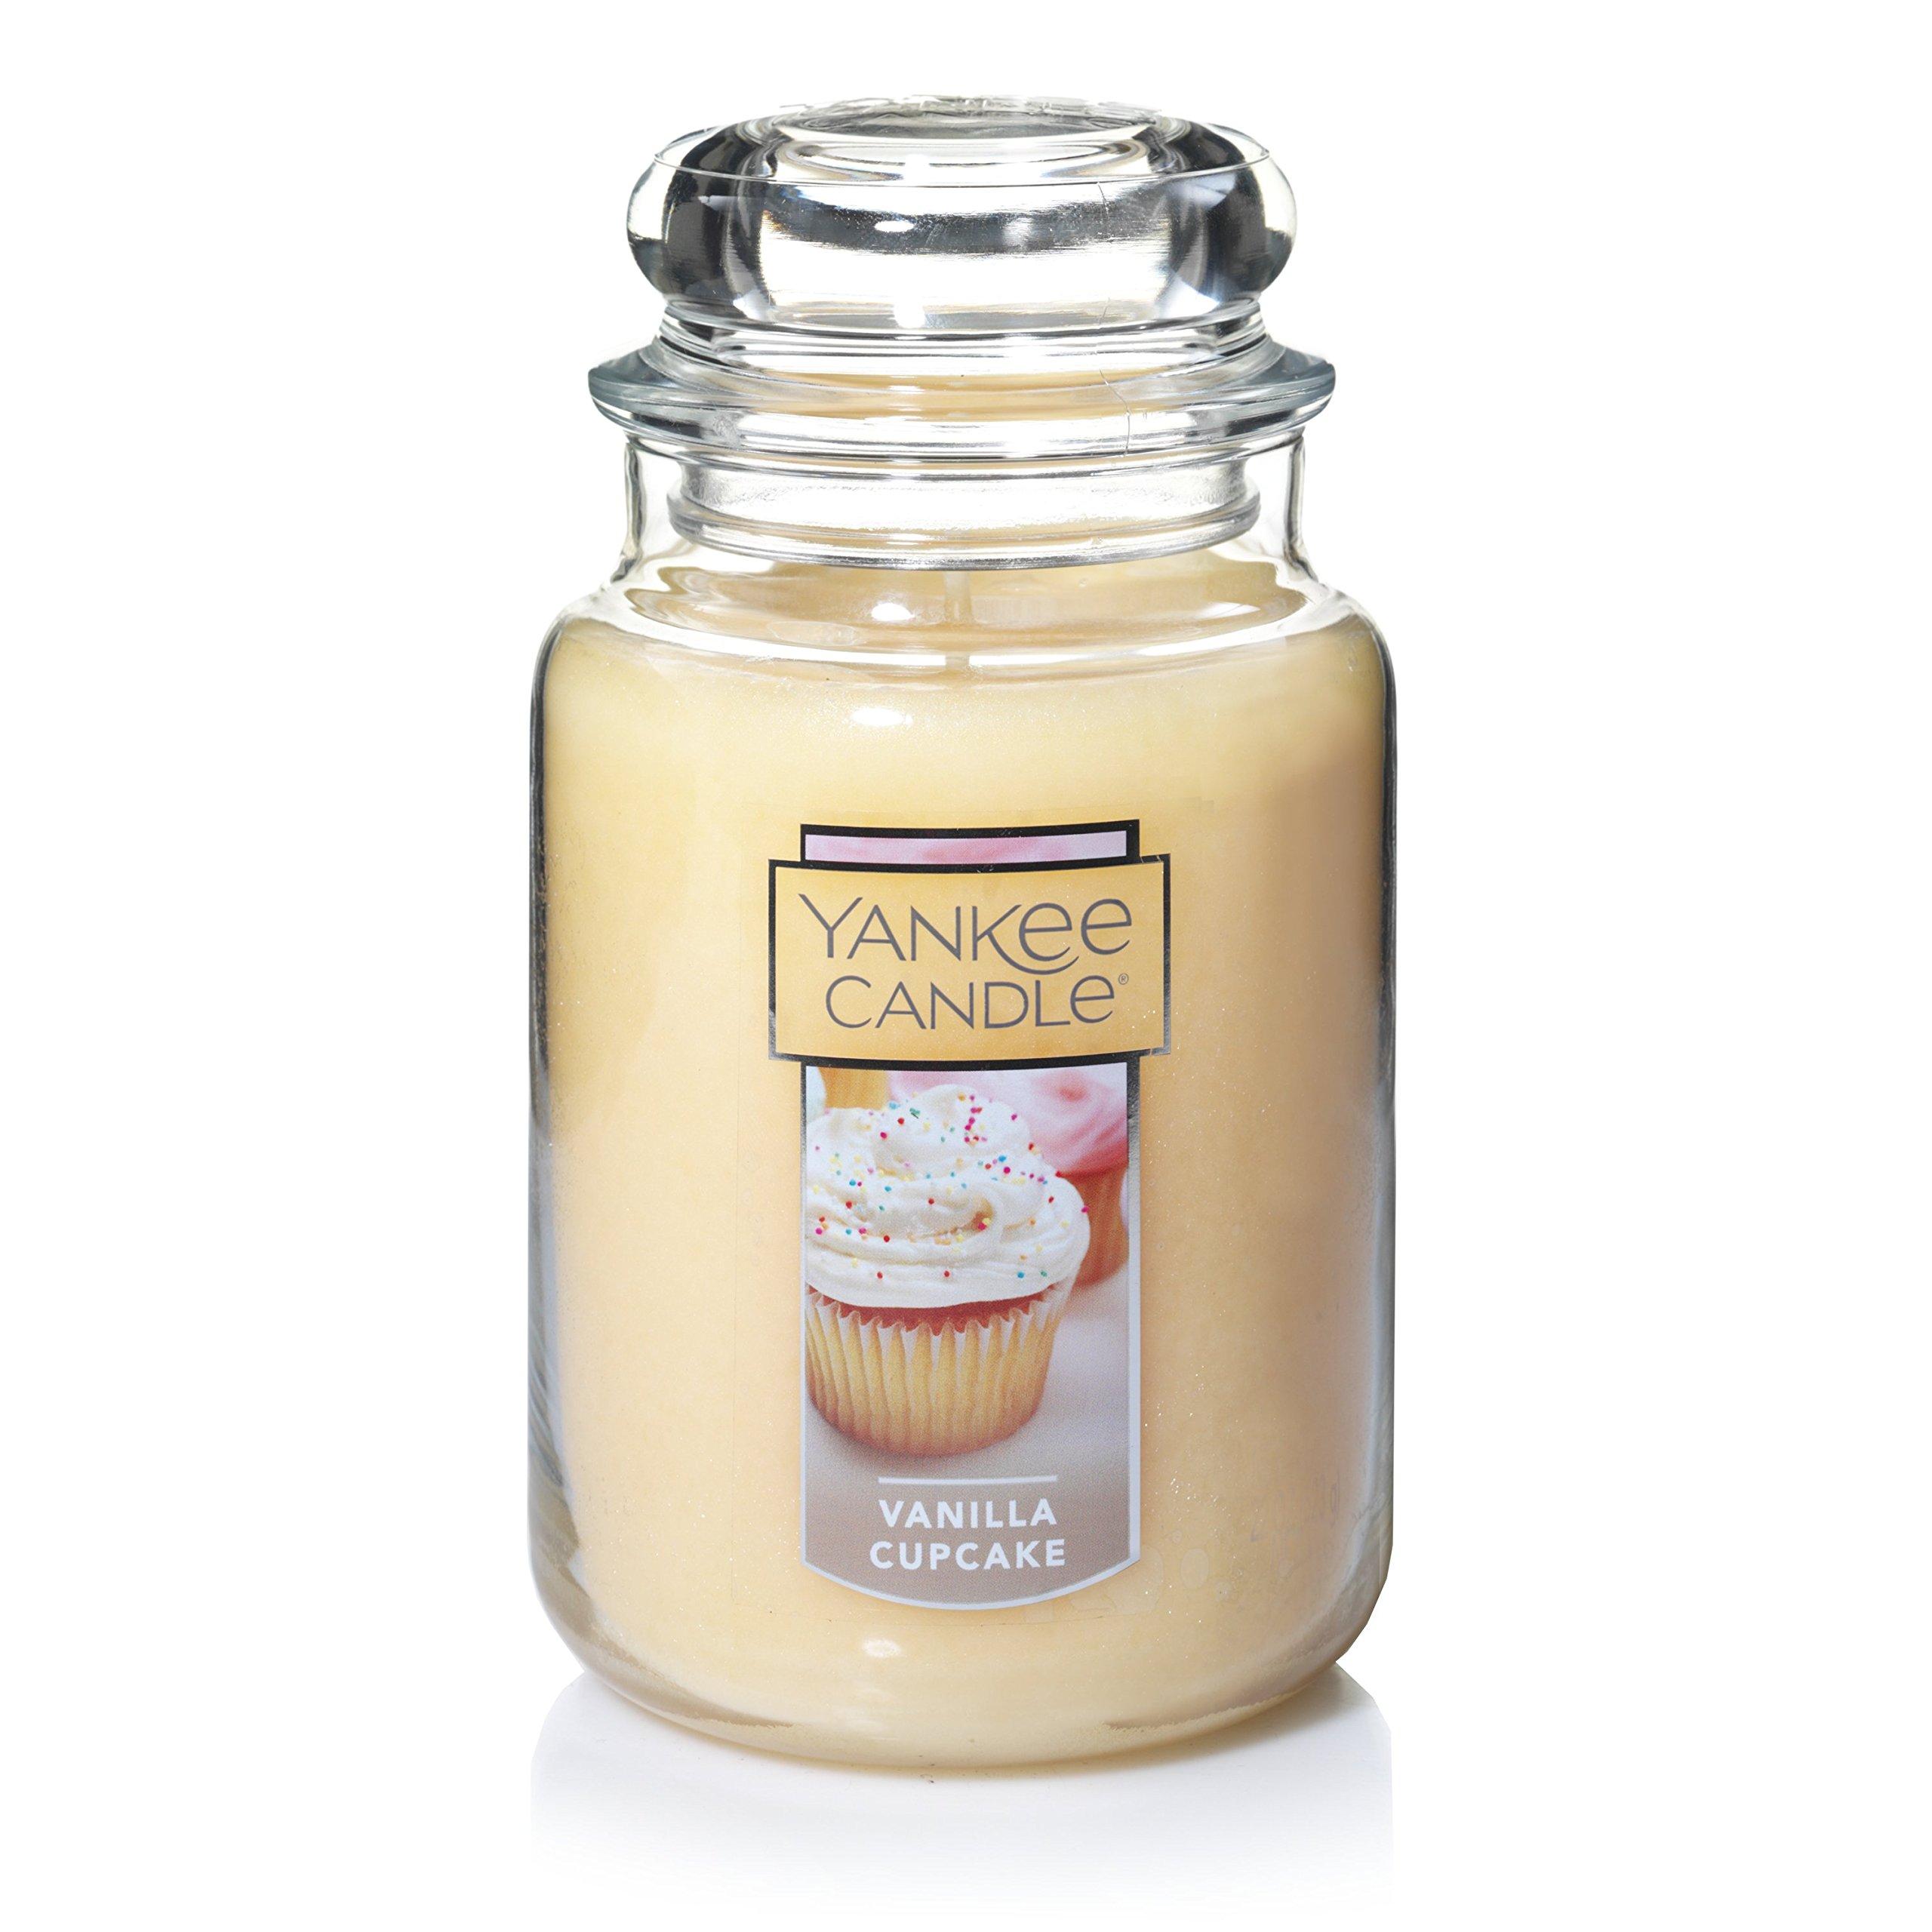 Yankee Candle Large Jar Candle Vanilla Cupcake by Yankee Candle